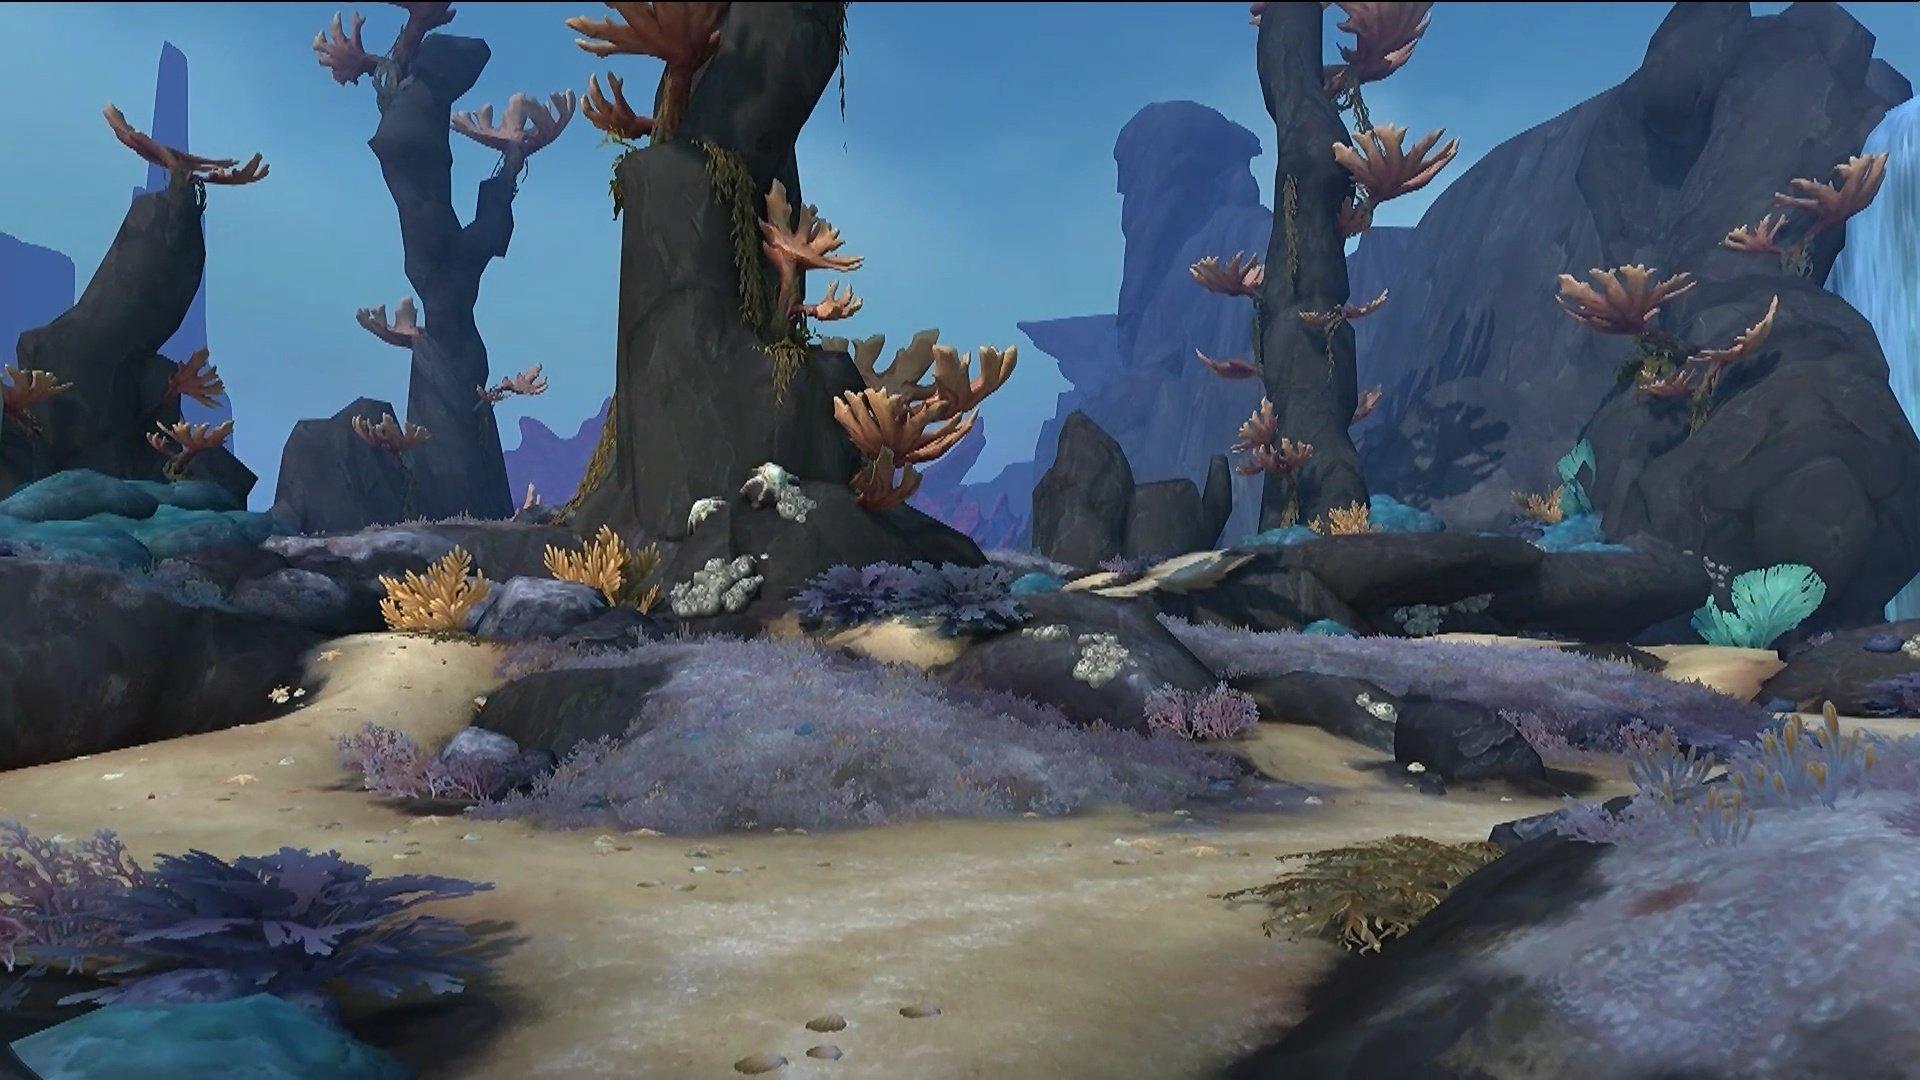 World of Warcraft: BFA gameplay video showcases Nazjatar